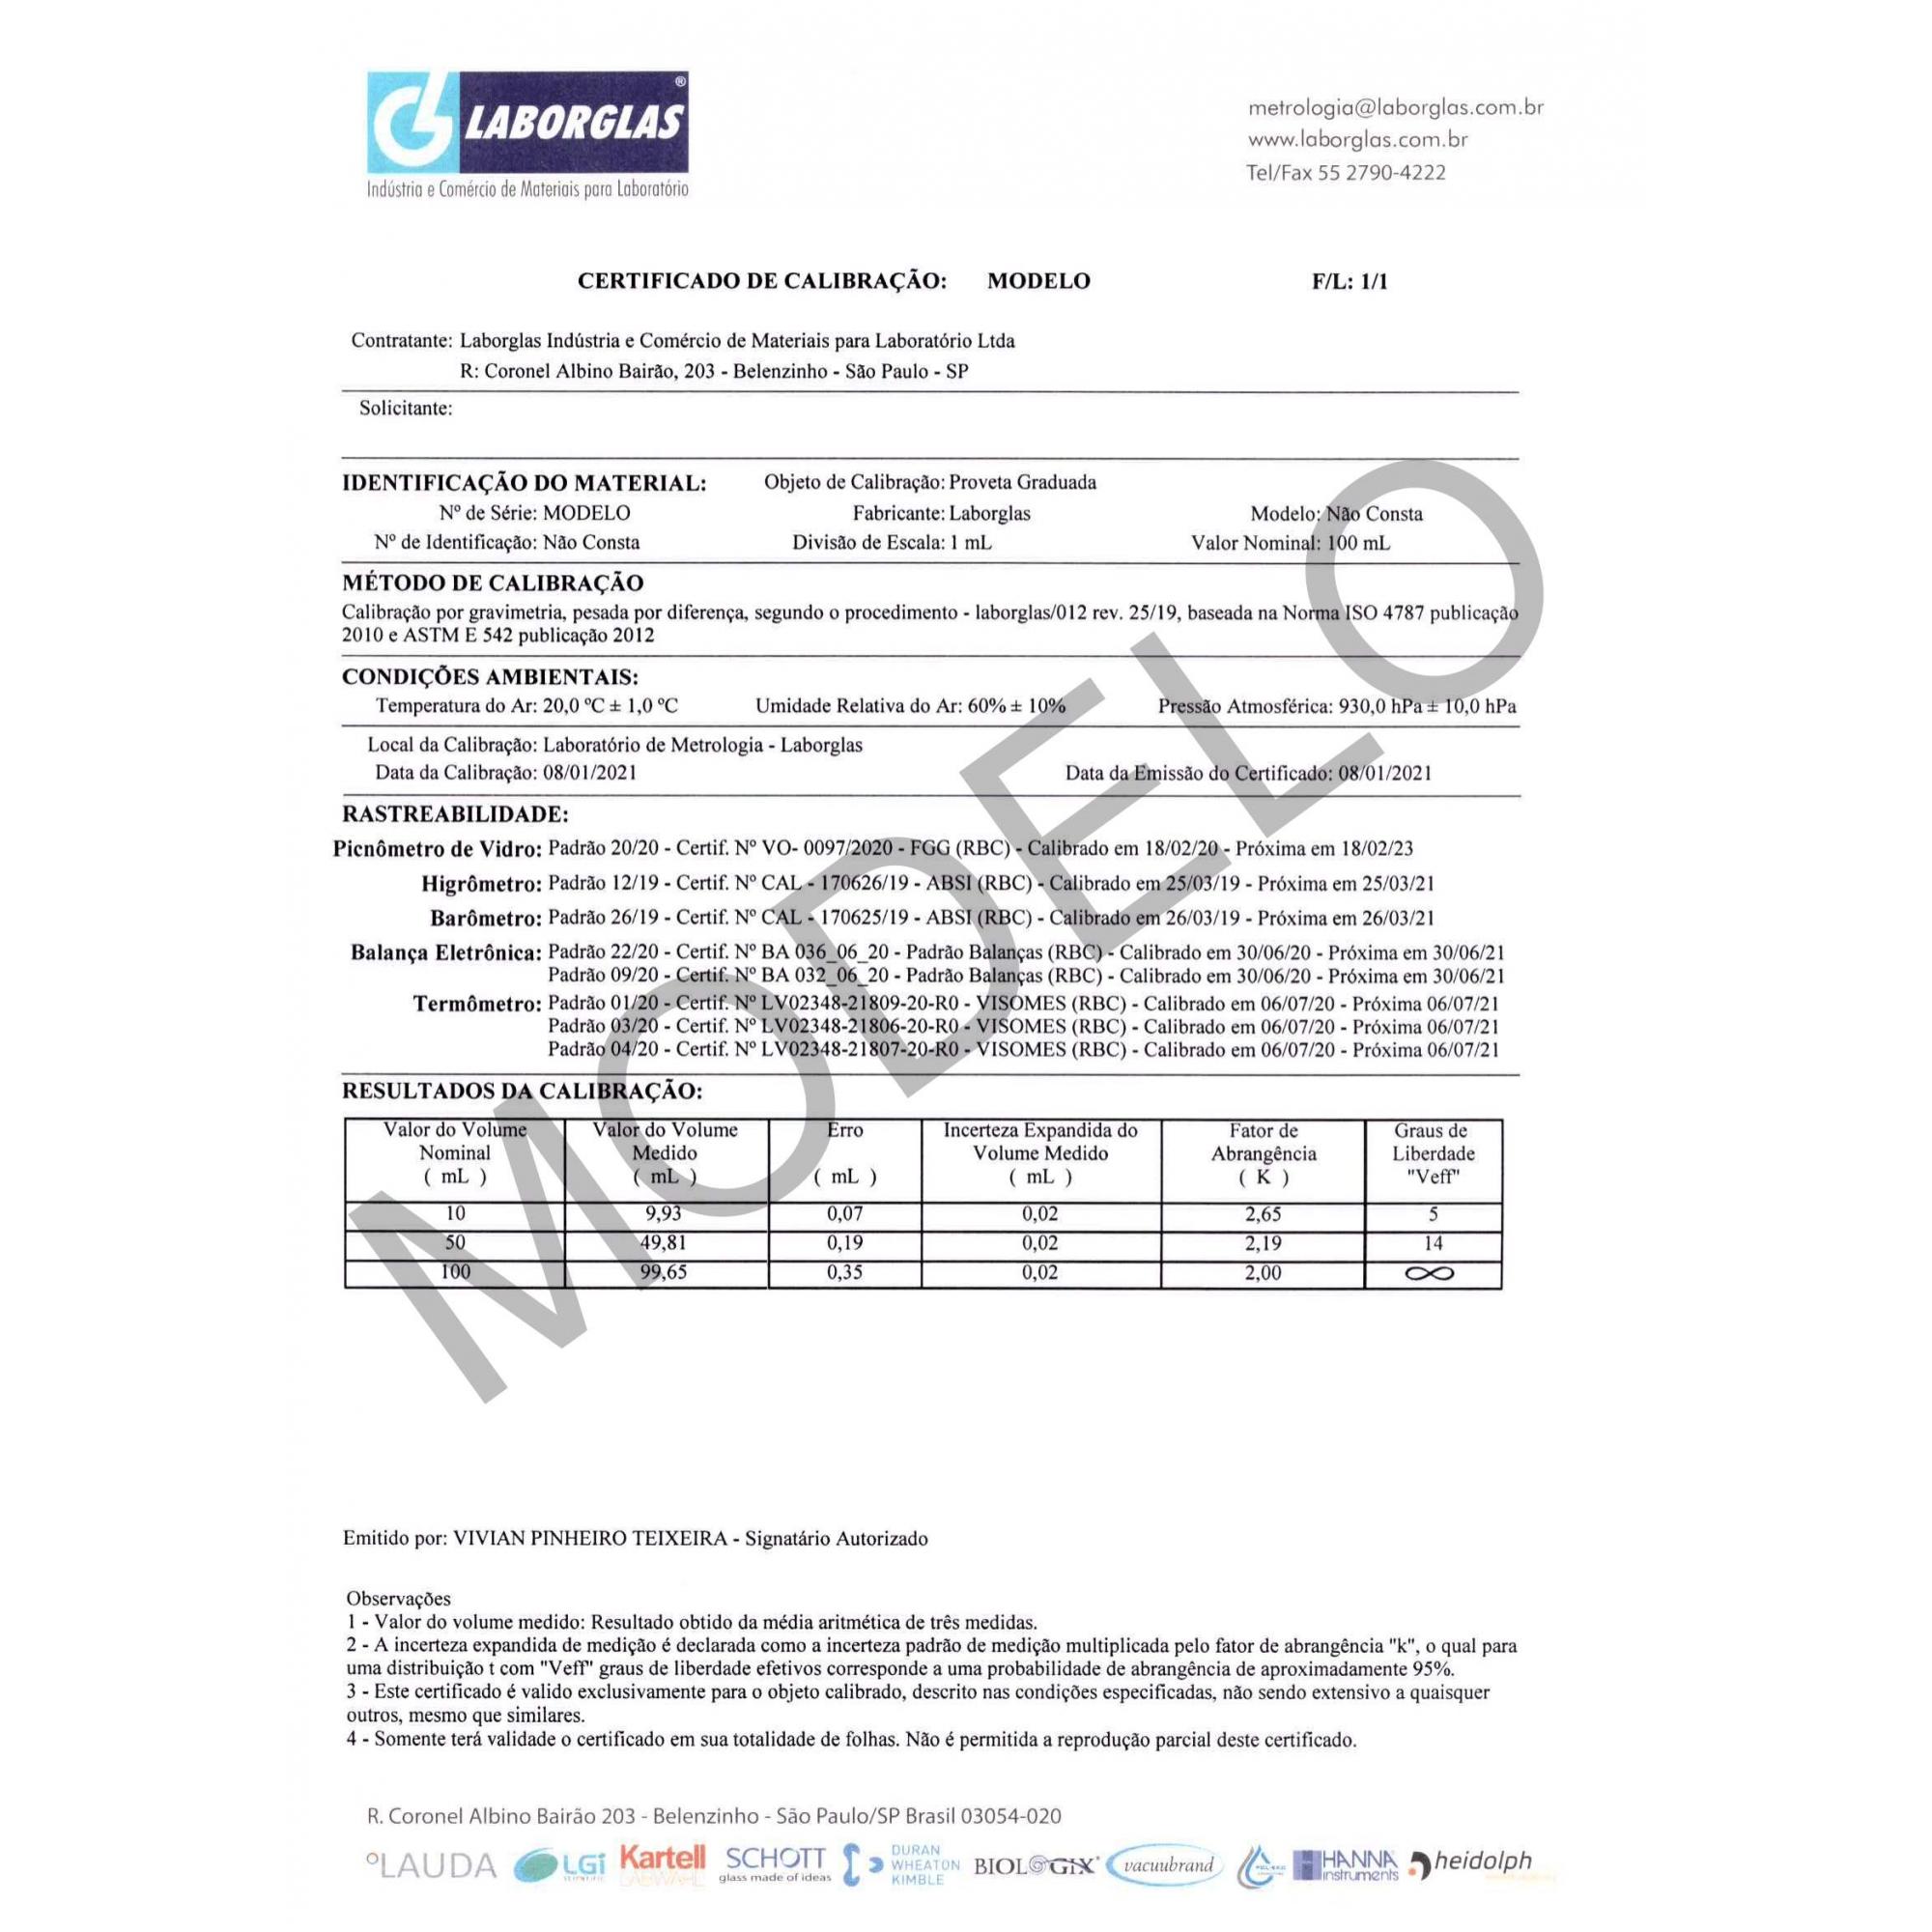 PROVETA GRADUADA BASE HEXAGONAL DE POLIPROPILENO 500 ML CLASSE A CERTIFICADO RASTREÁVEL - Laborglas - Cód. 9138744-C